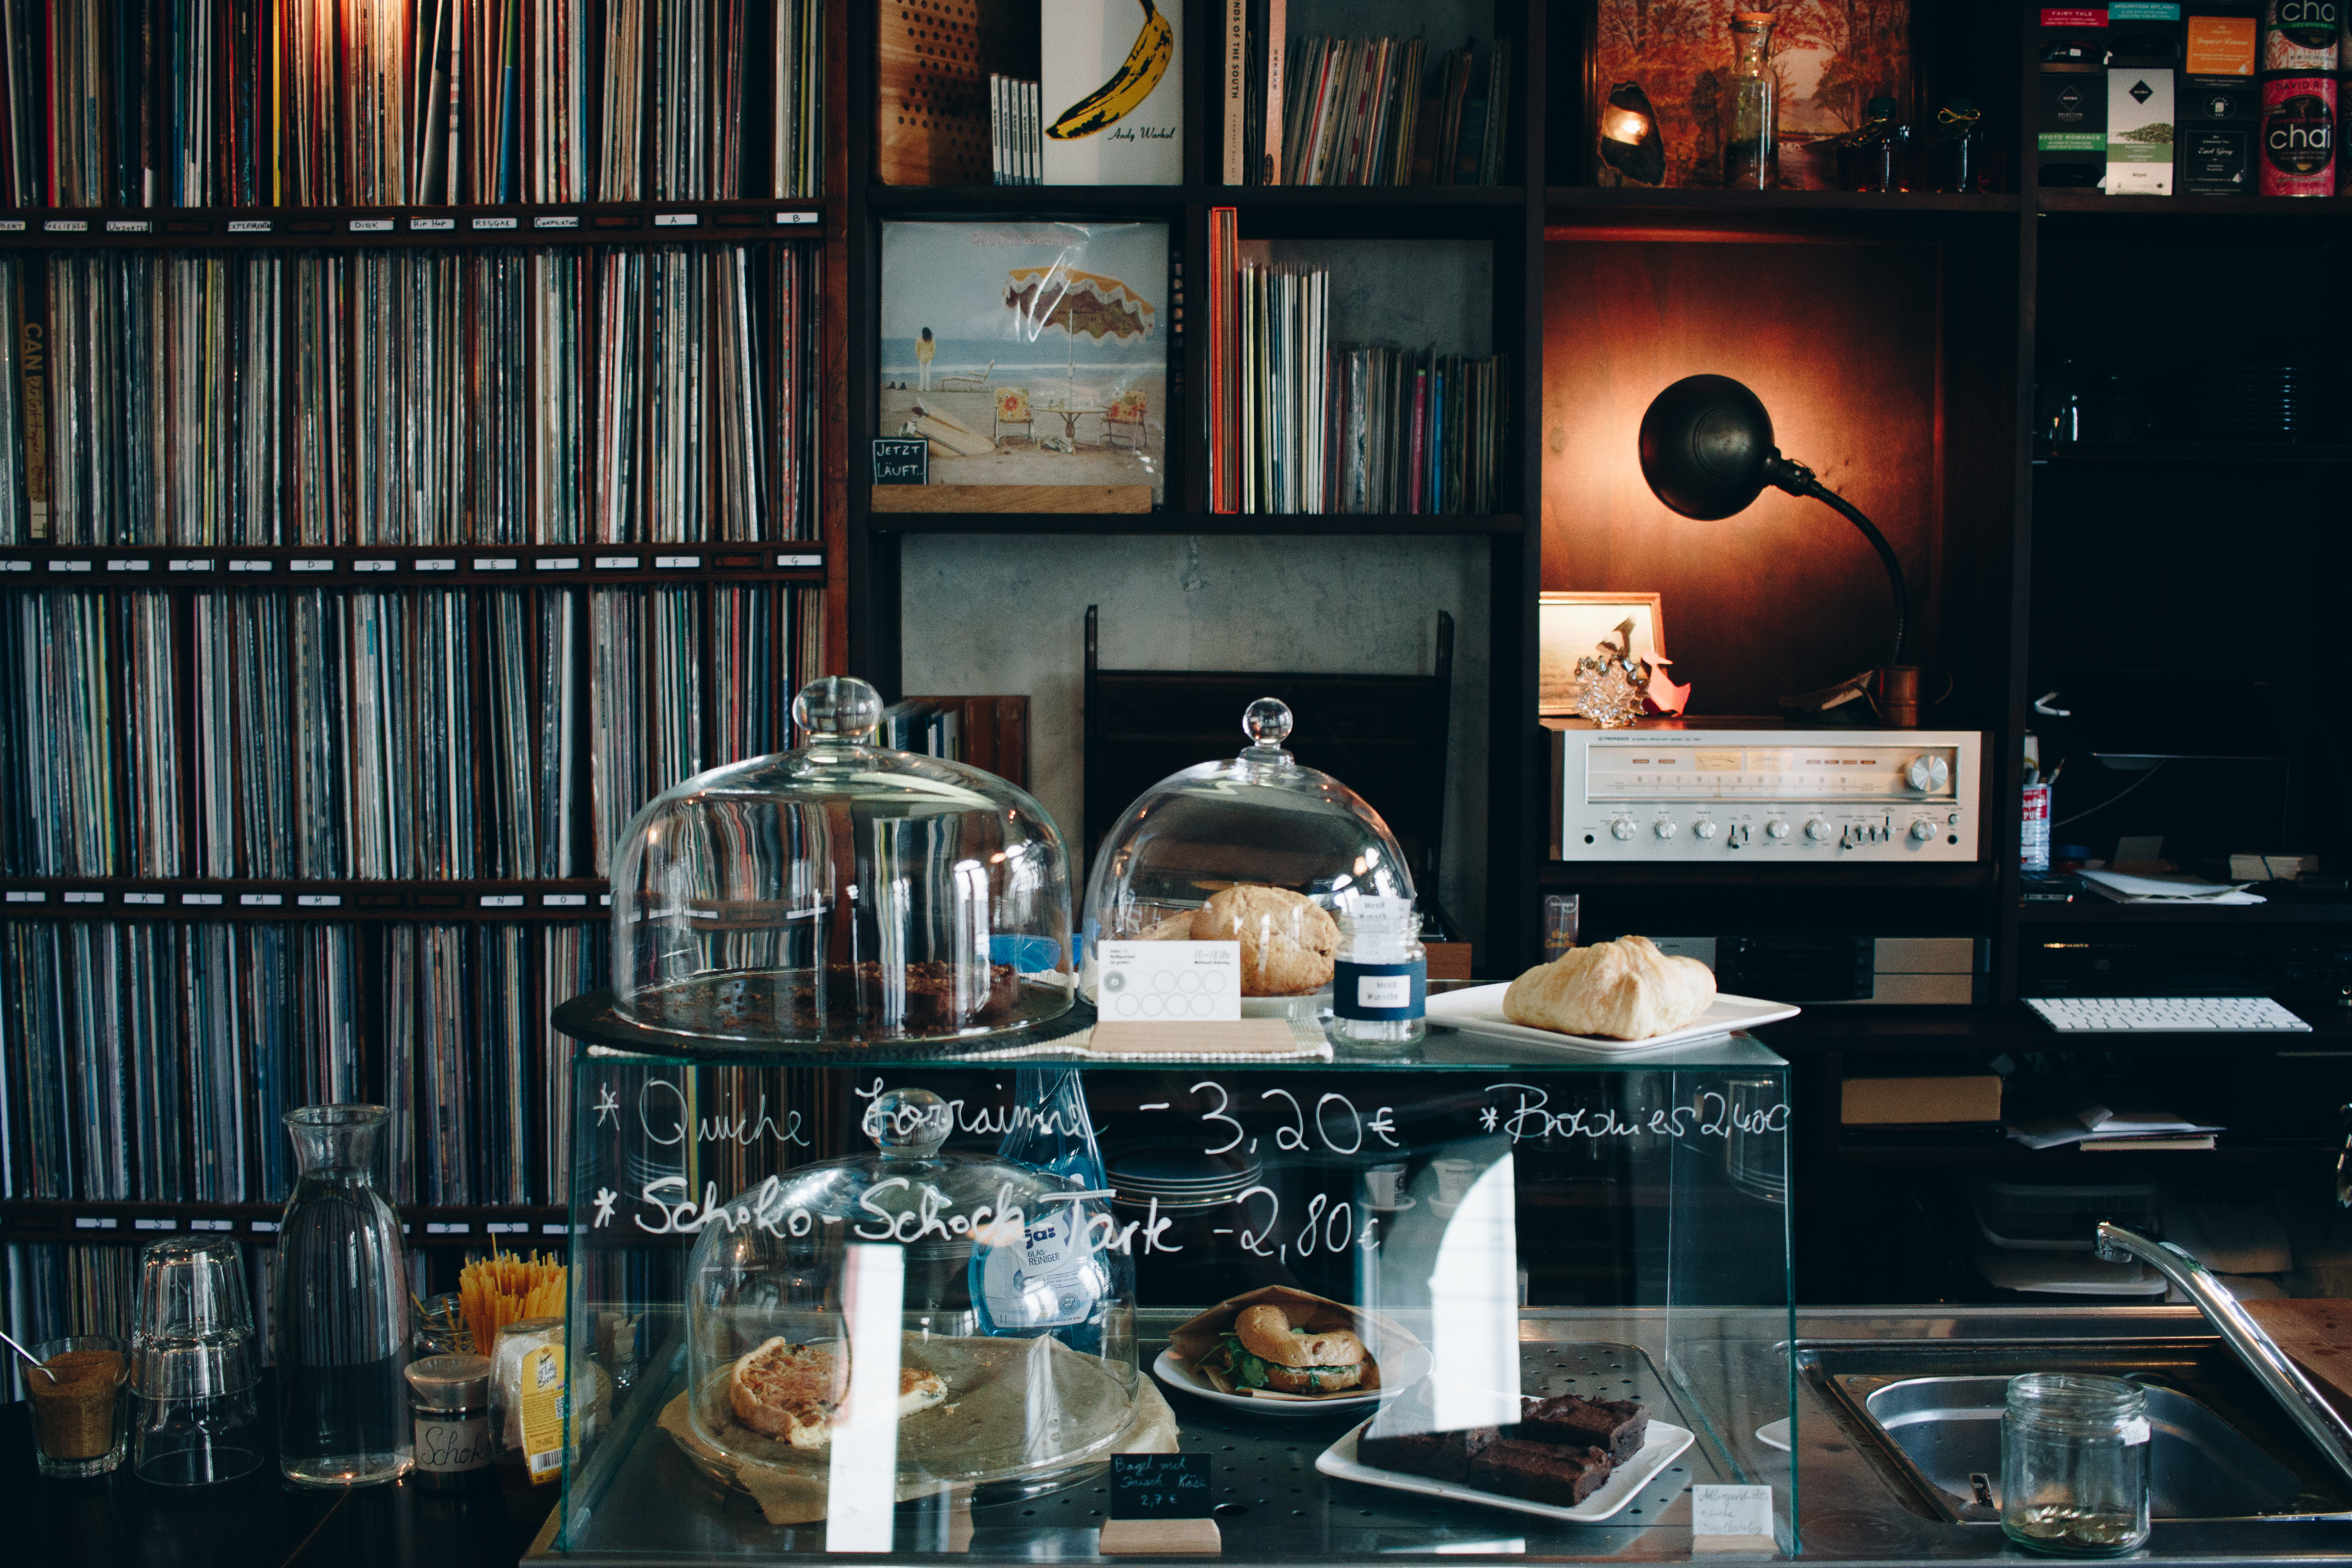 s1 vinyl&kaffee-leutzsch-leipzig-annabelle sagt4